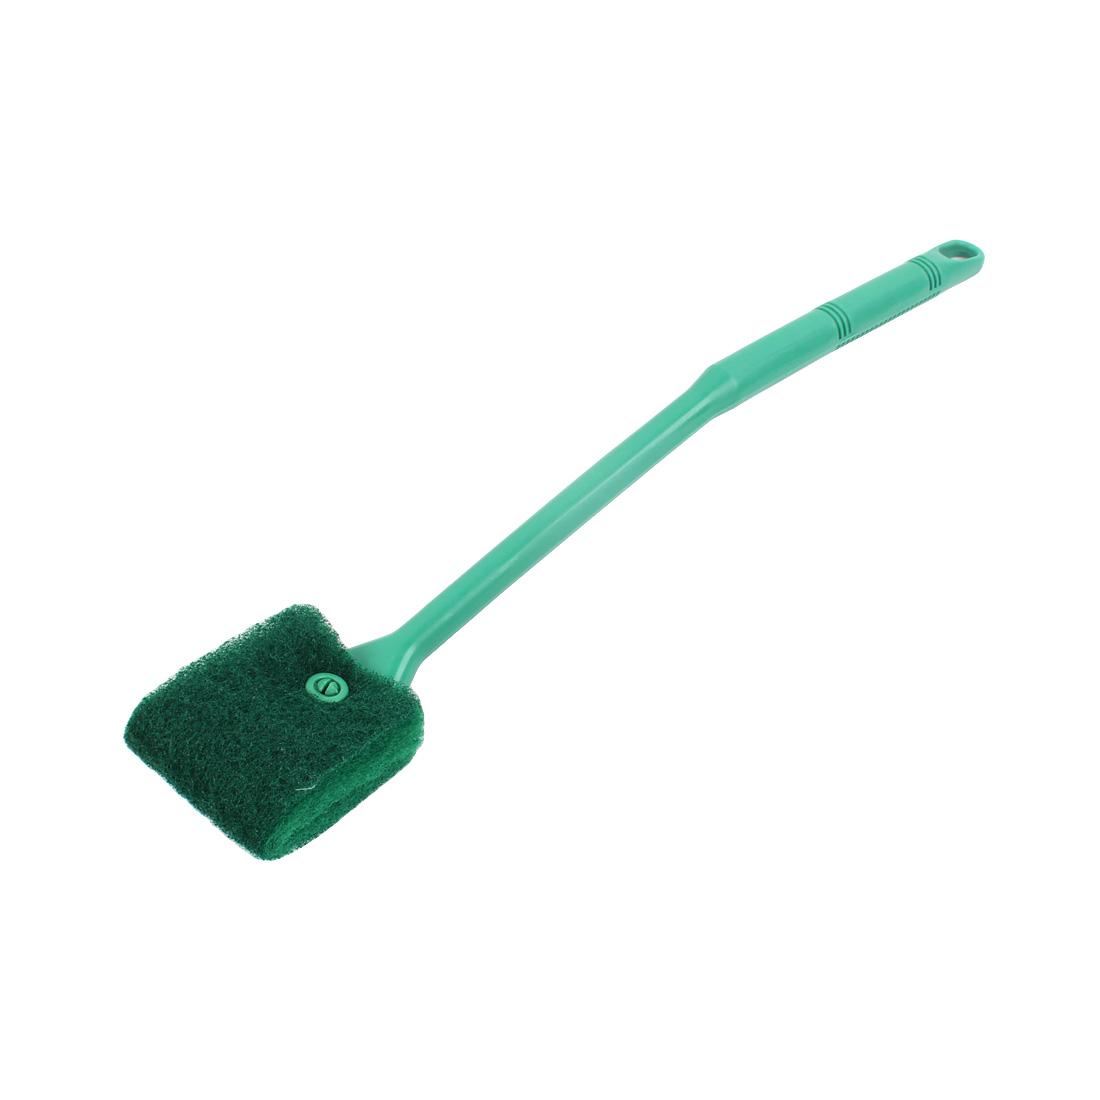 Aquarium Plastic Handle Dual Side Sponge Clean Brush Cleaner Green